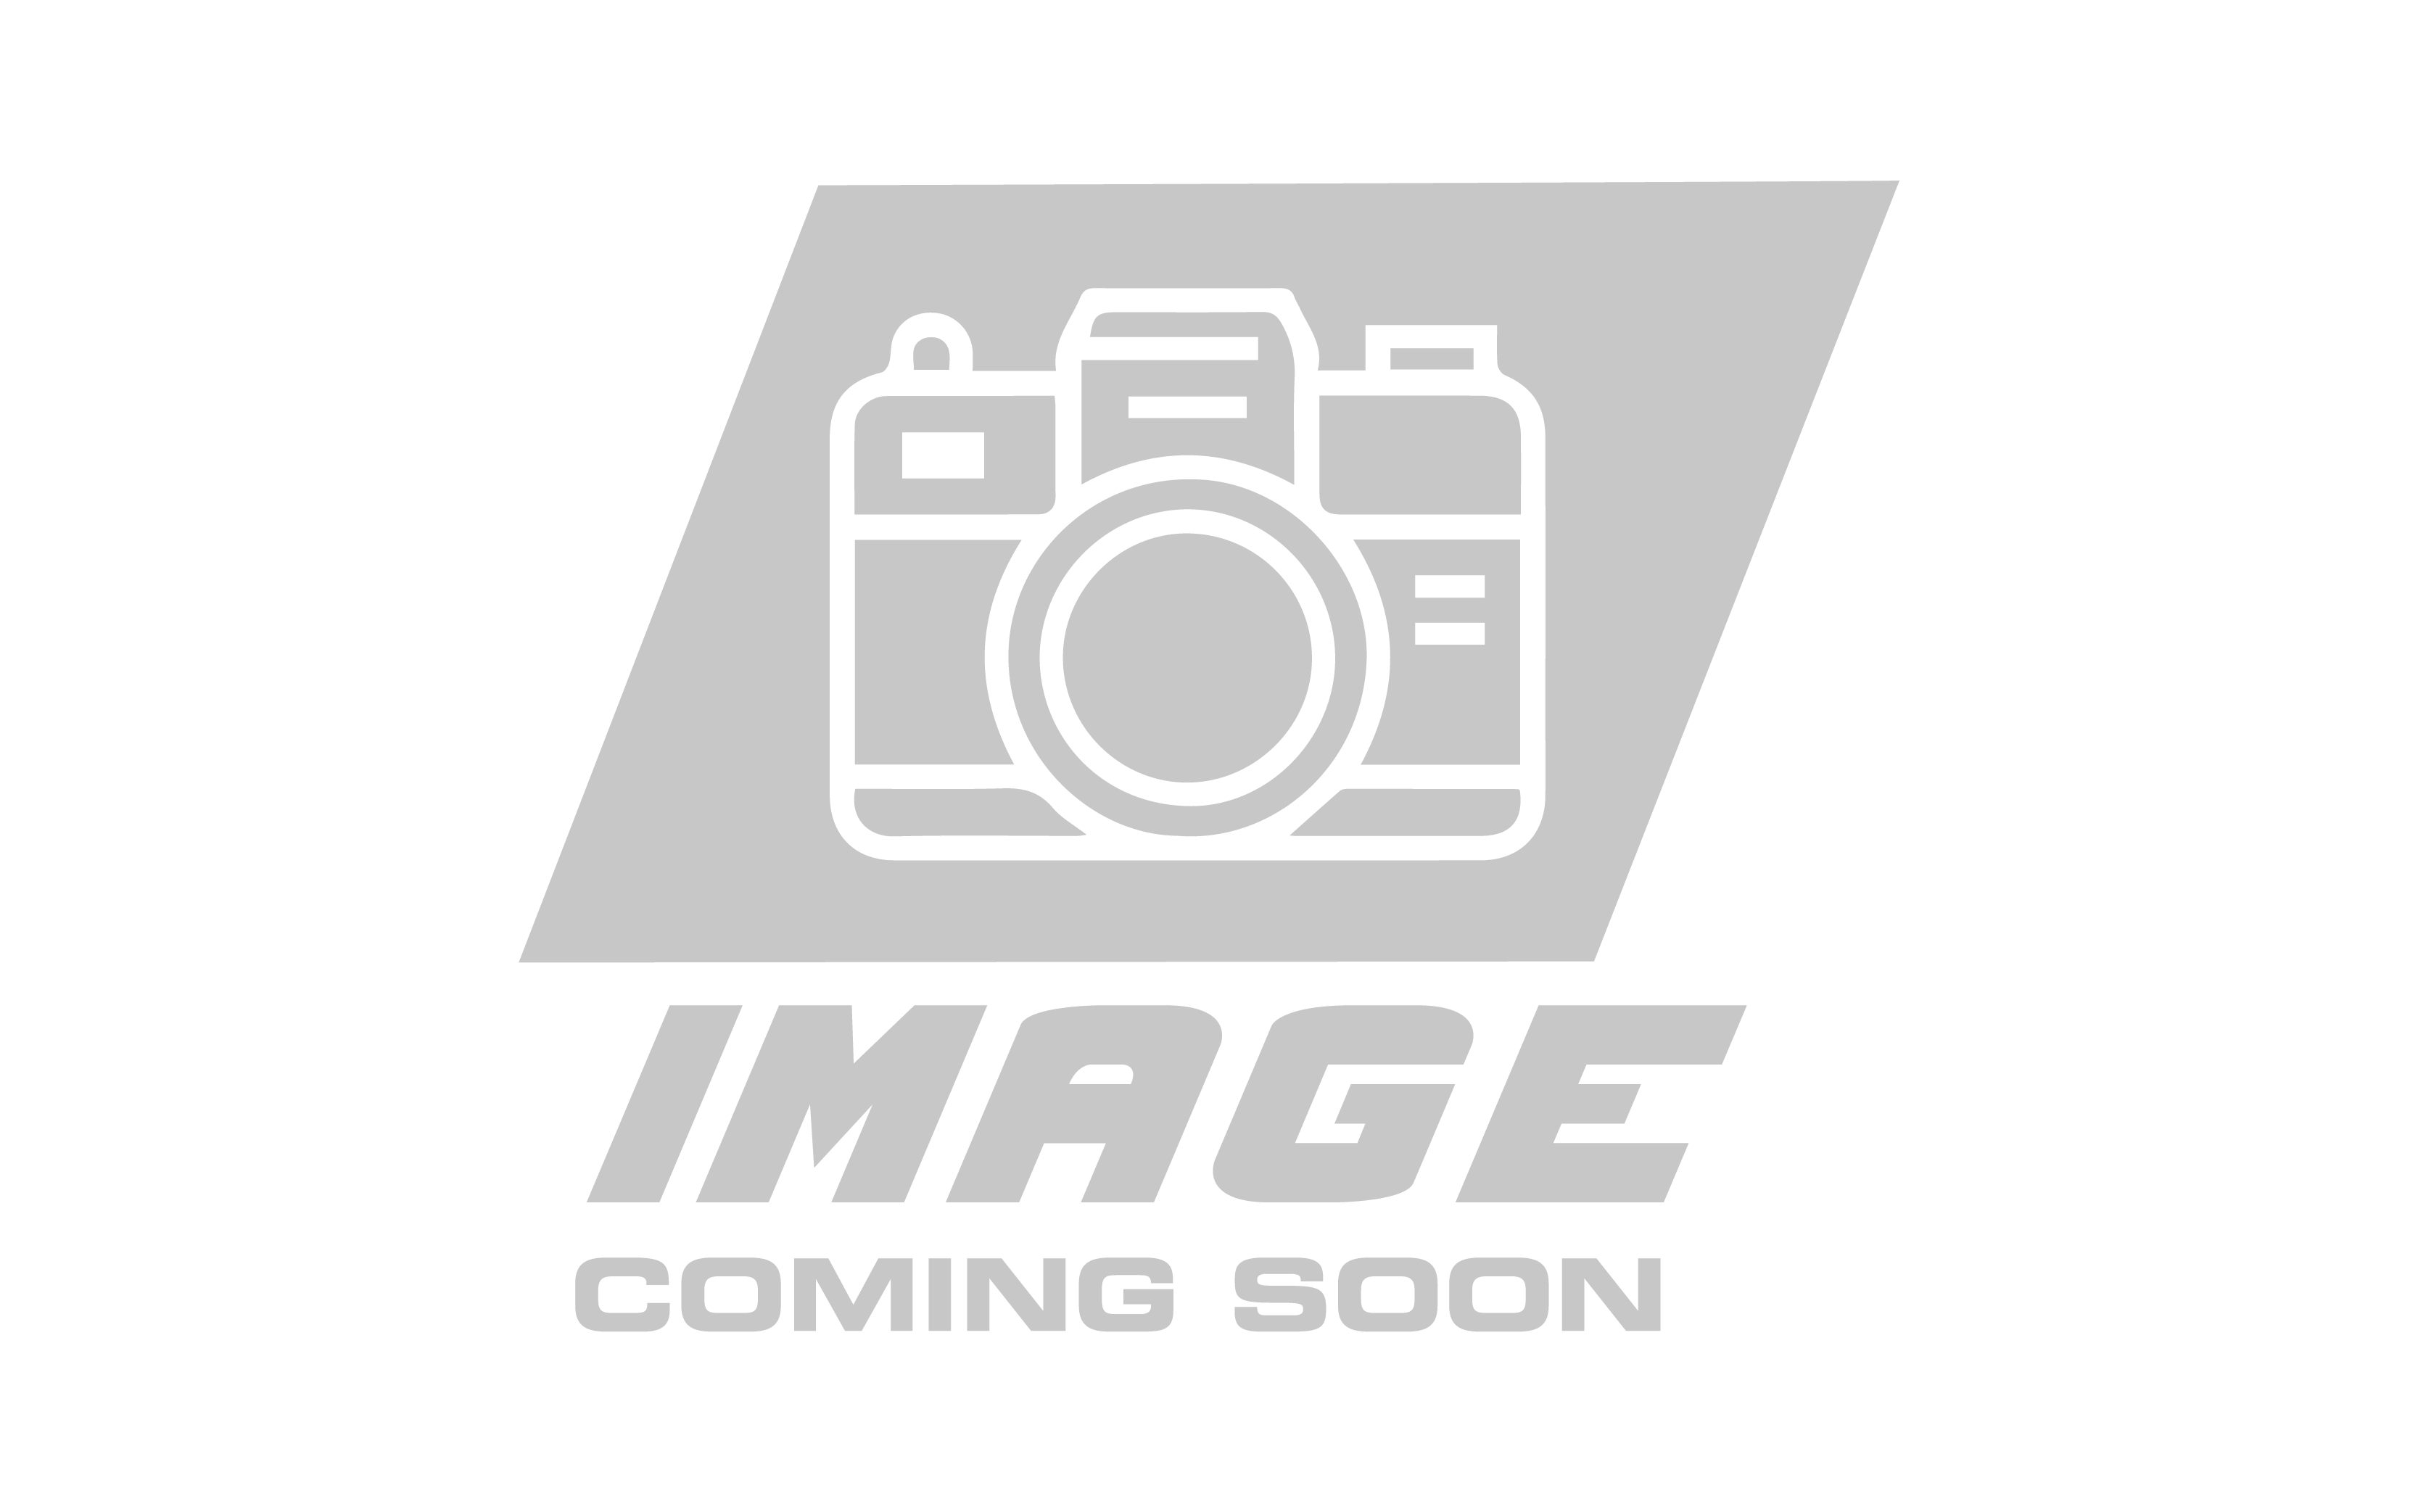 porsche_911_964_air_lift_performance_series_sleeve_style_3